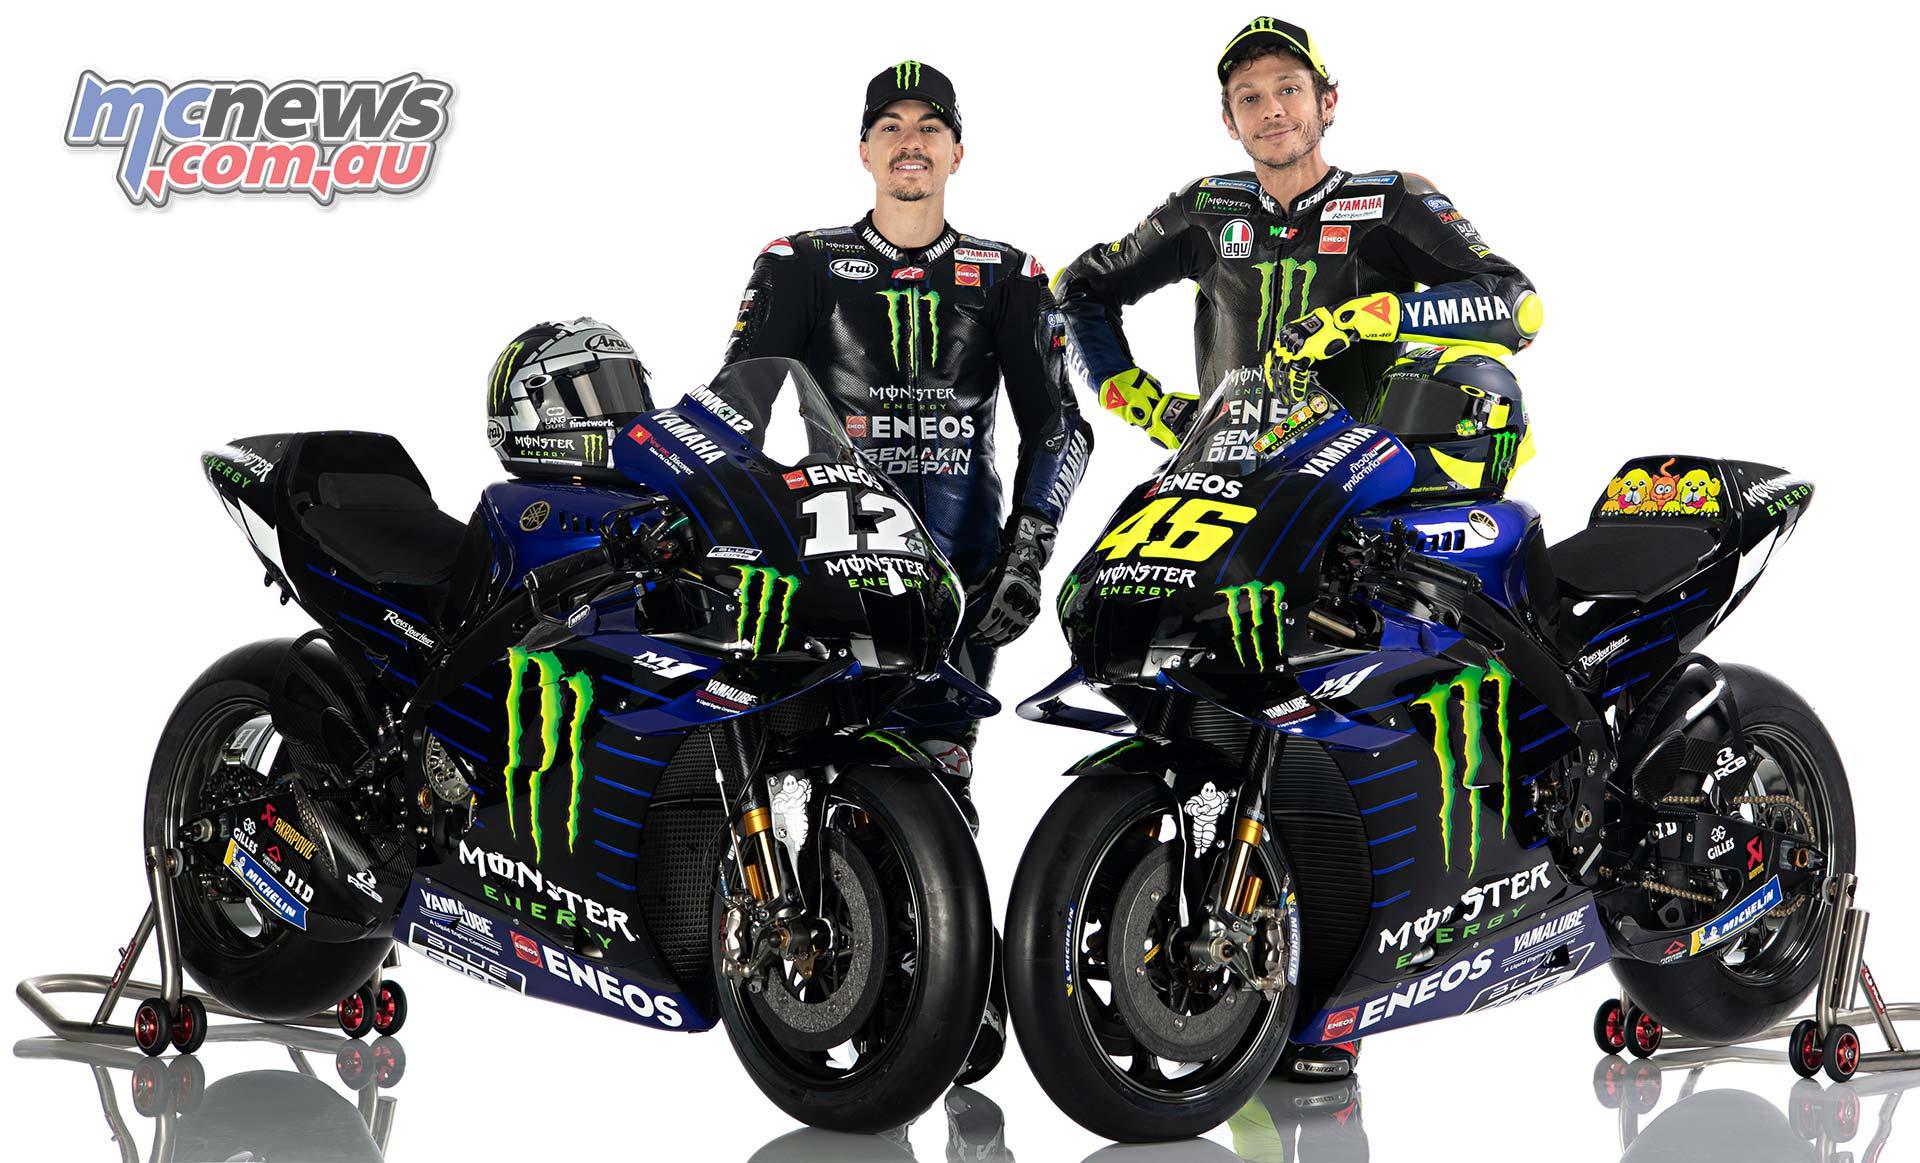 2020 Yamaha Yzr M1 And Yamaha Motogp Team Mcnews Com Au